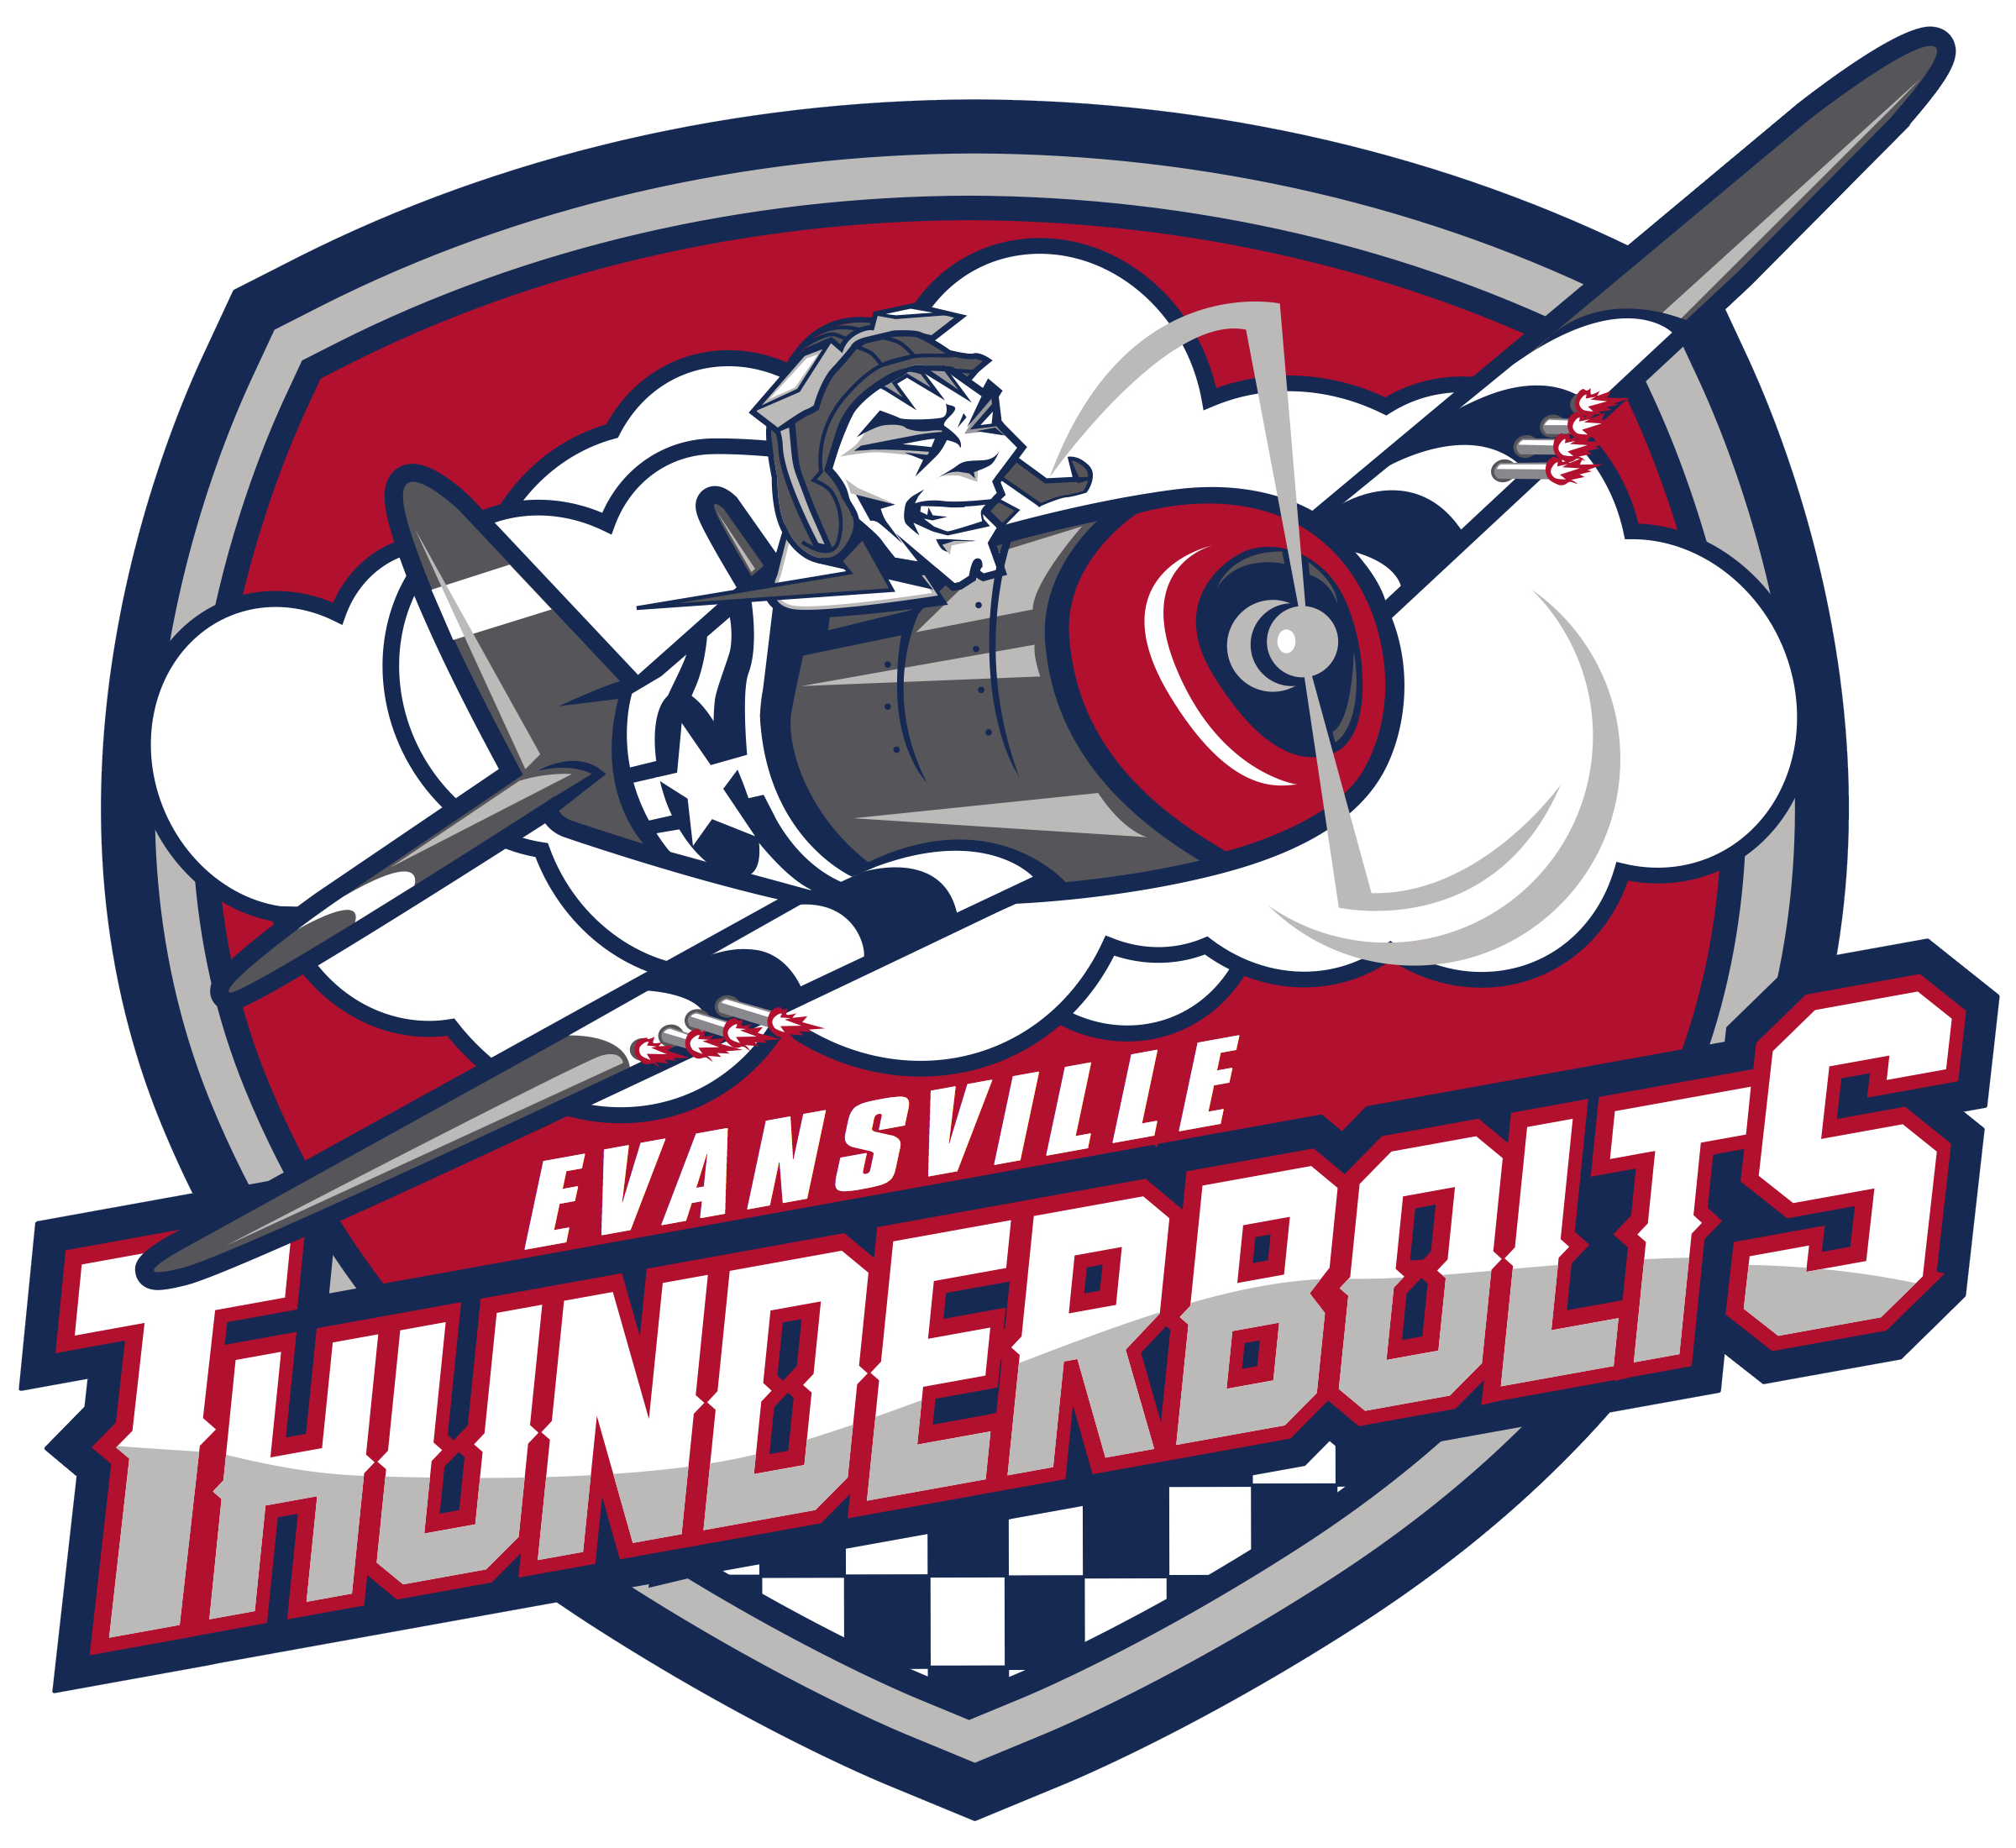 evansville_thunderbolts_2016-17